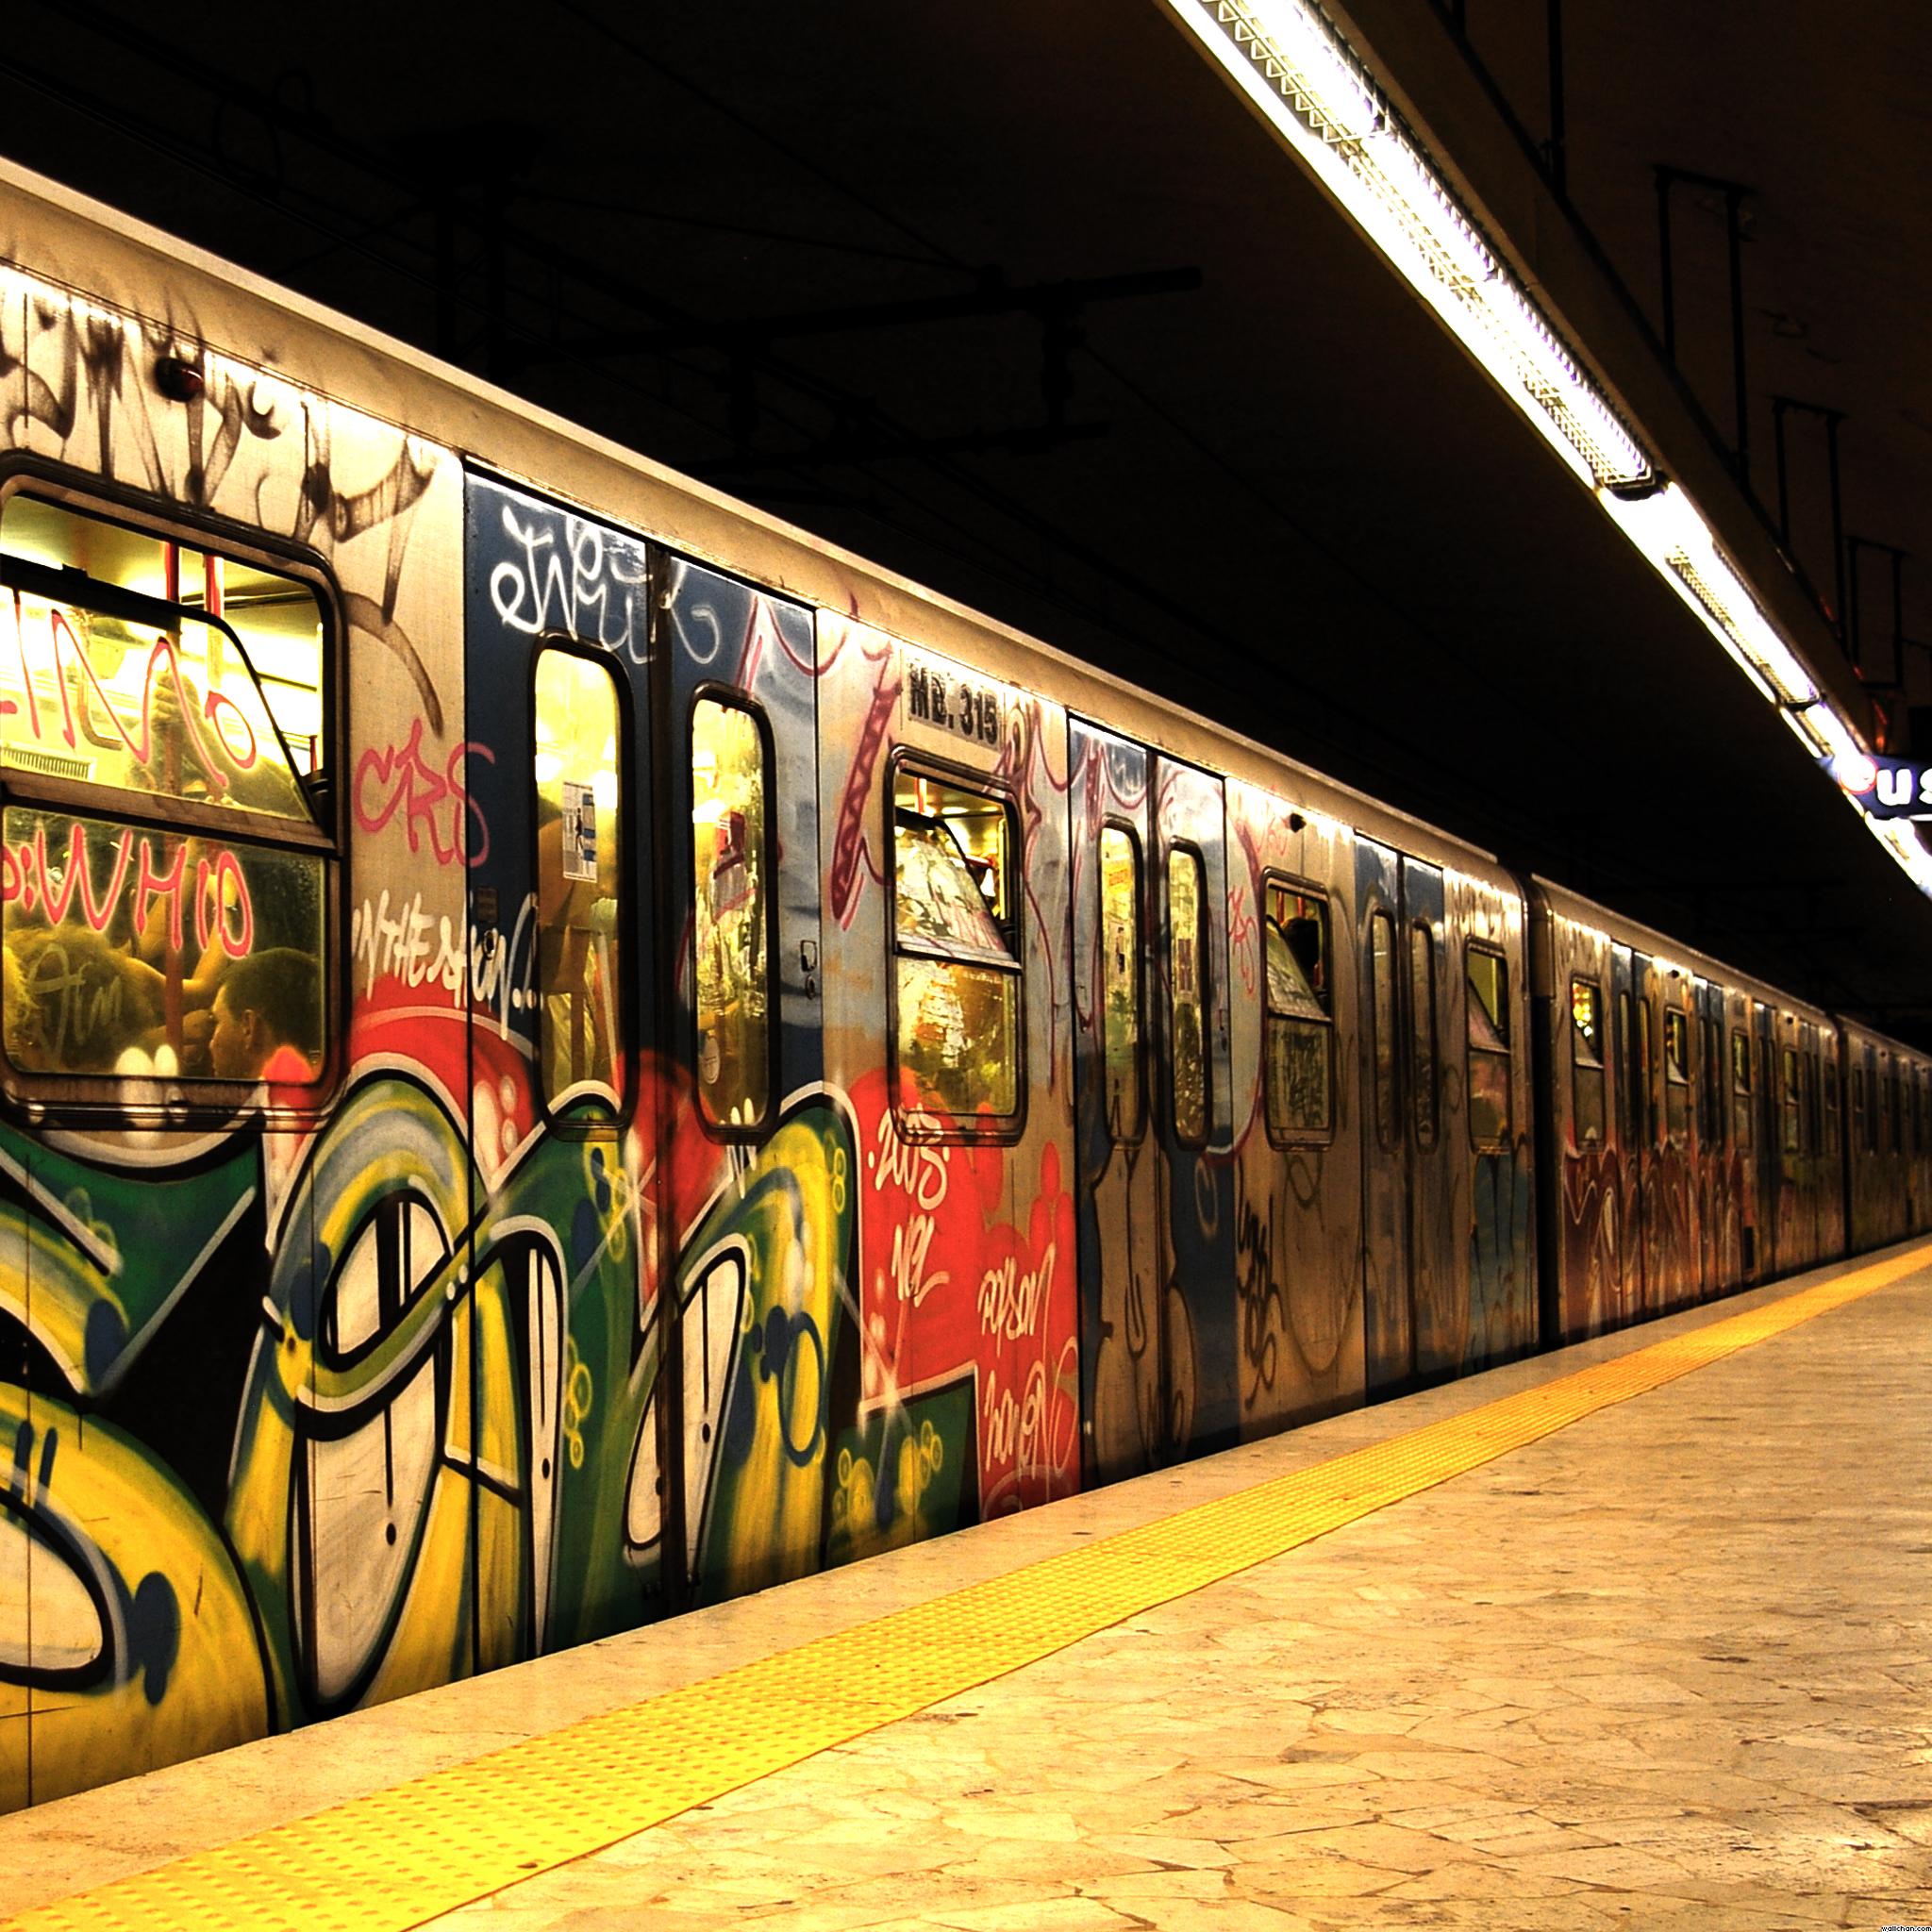 Ghetto-Train-3Wallpapers-iPad-Retina